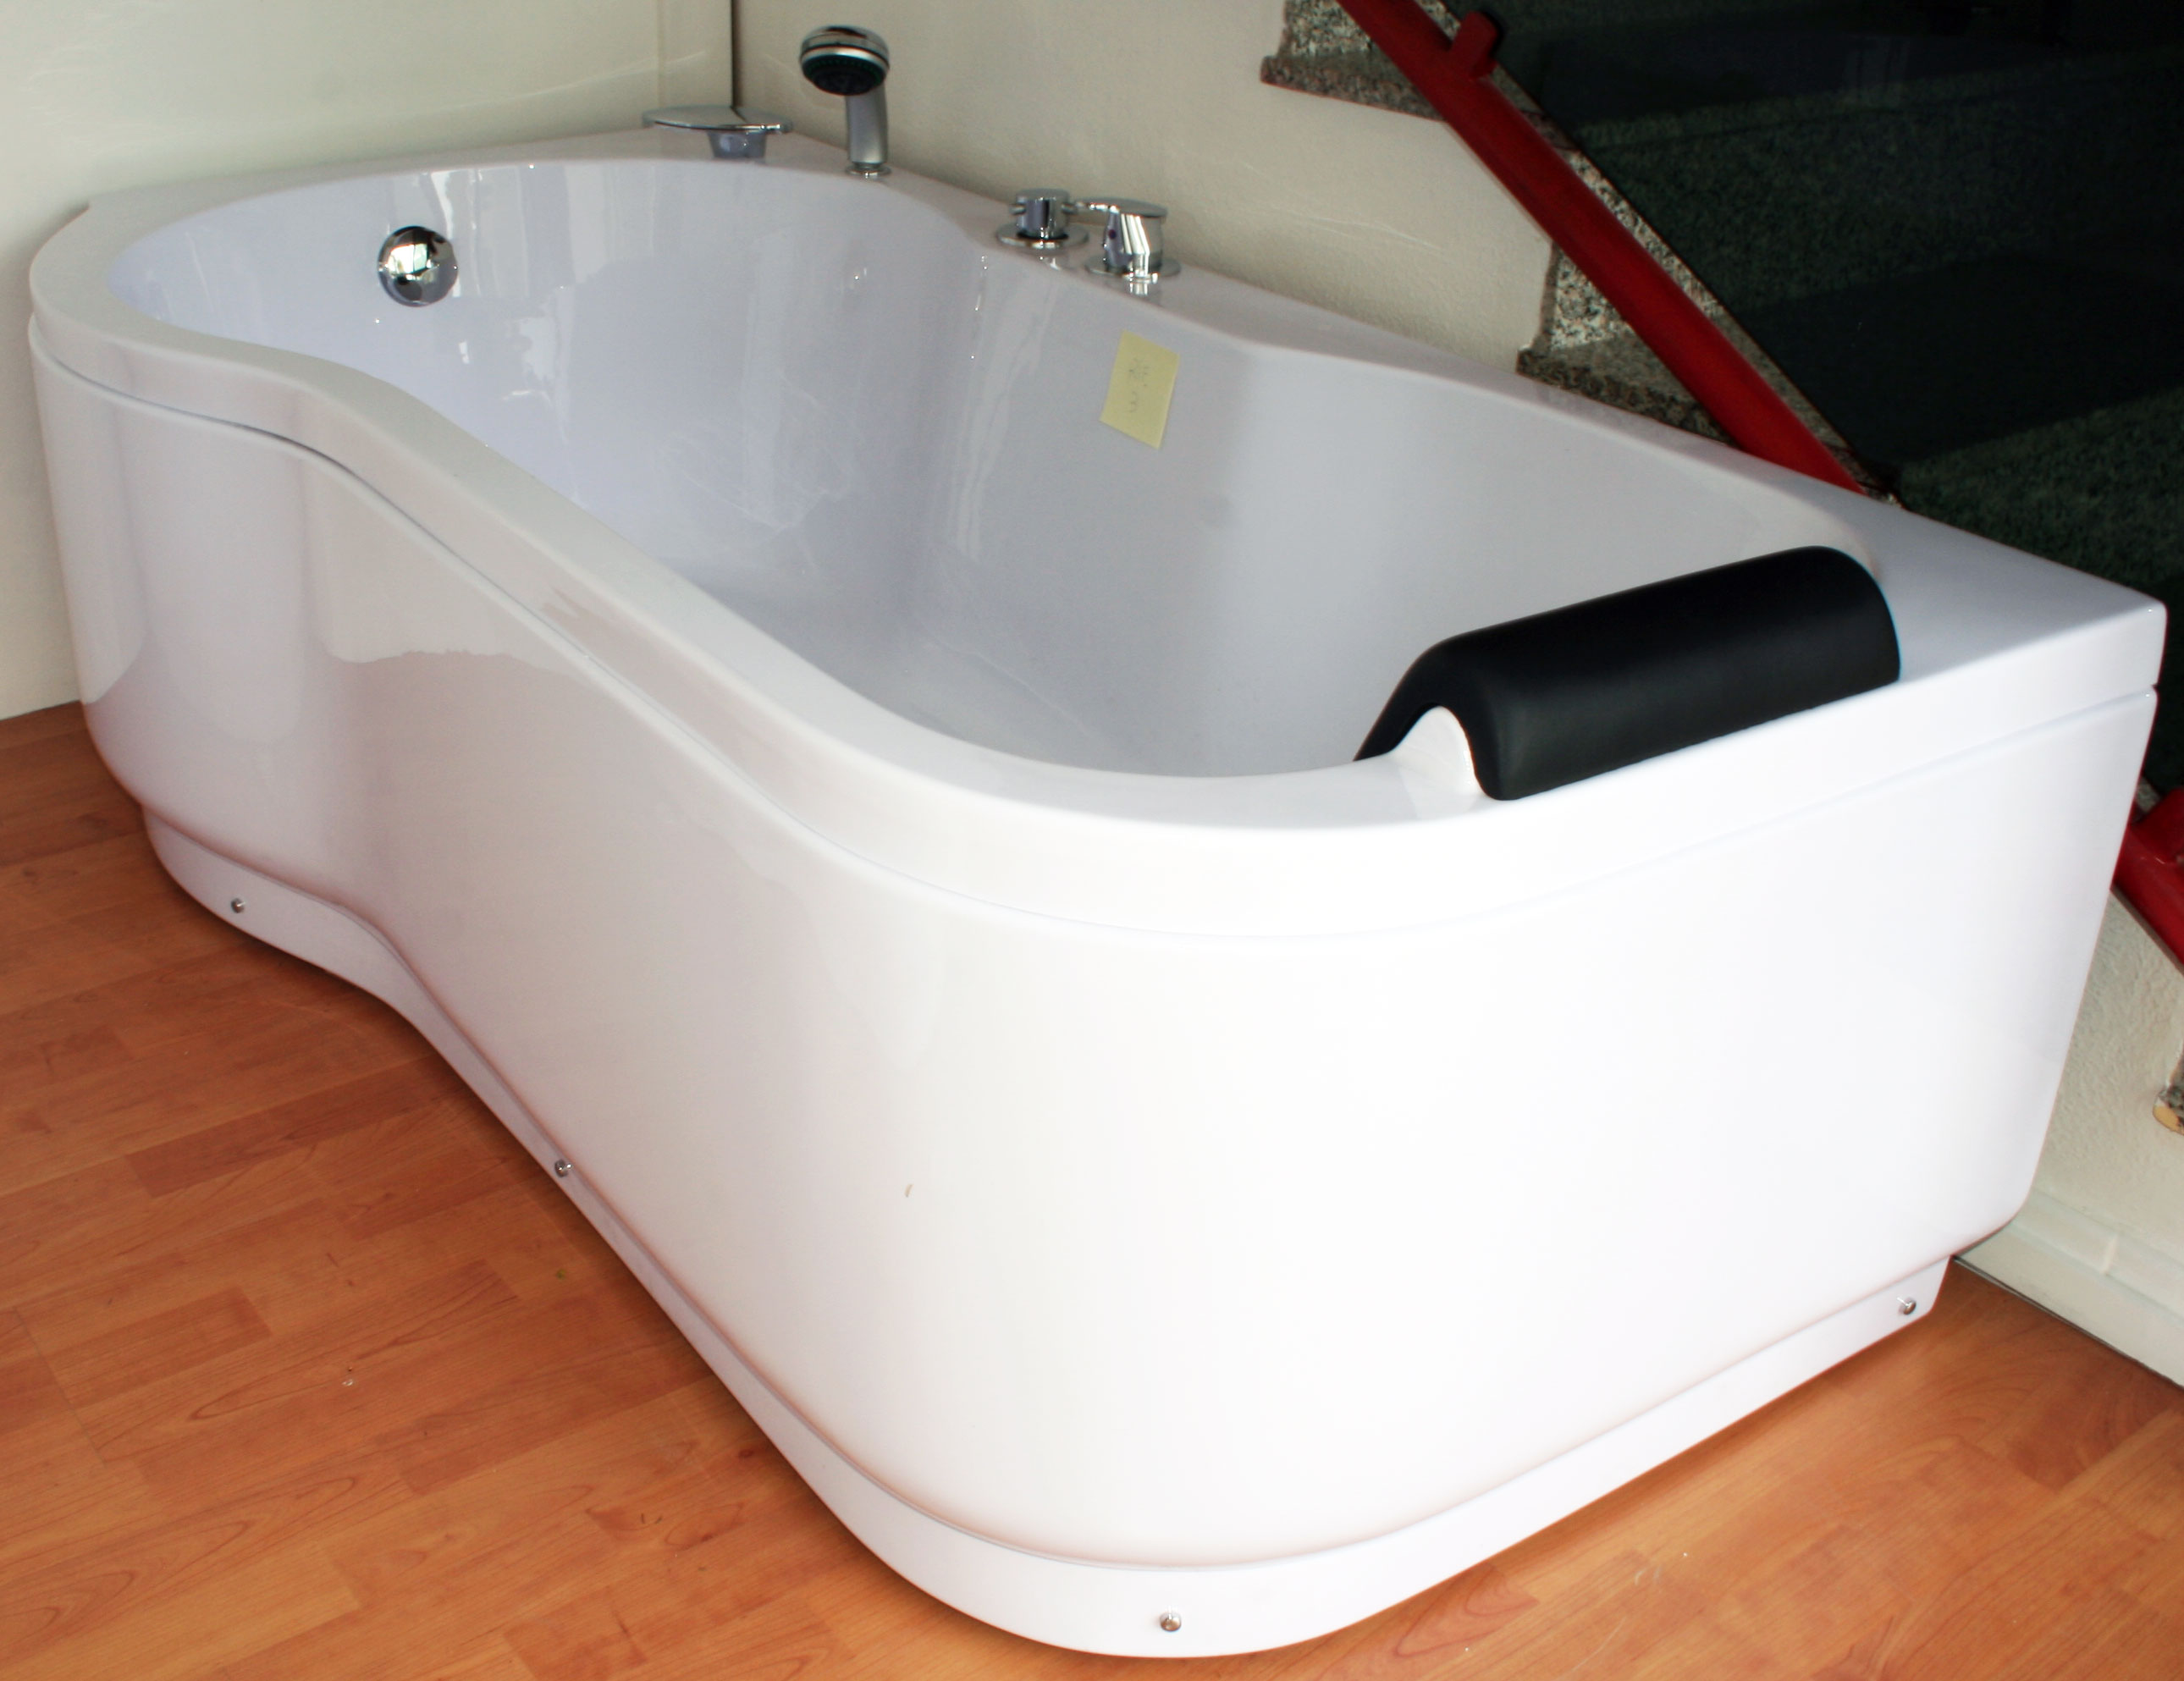 Offerta Vasca Da Bagno Angolare : Rif vasca da bagno angolare sinistra box doccia